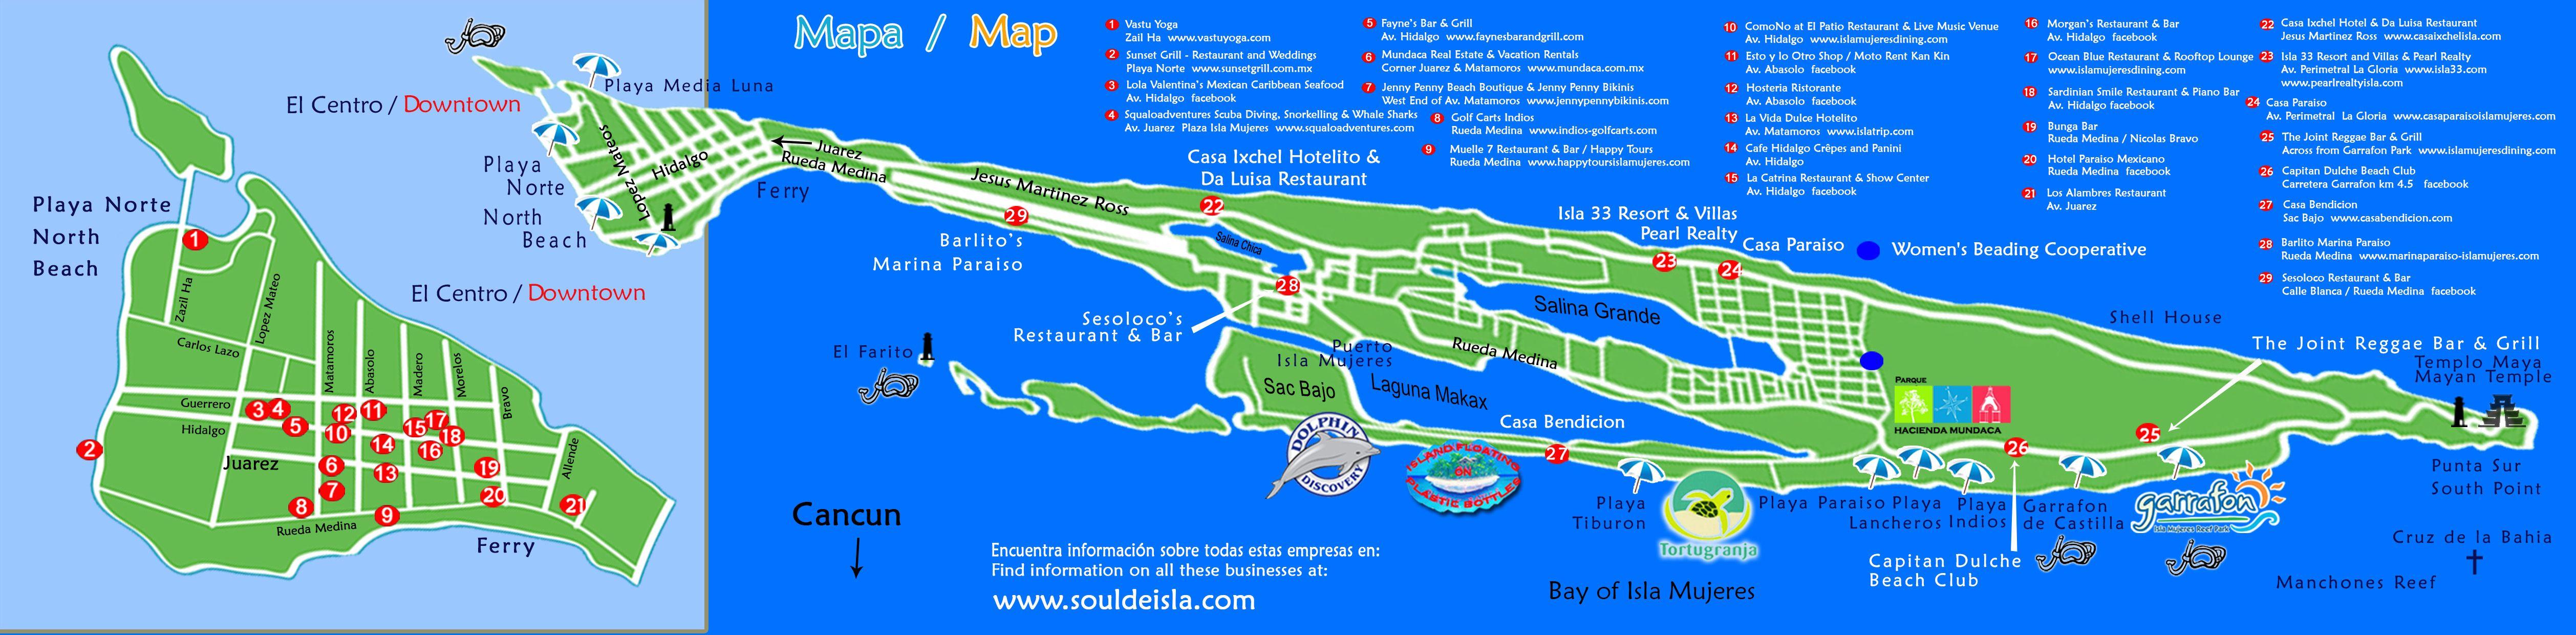 Isla Mujeres Map Isla Mujeres Tourist Guide 3 Pinterest